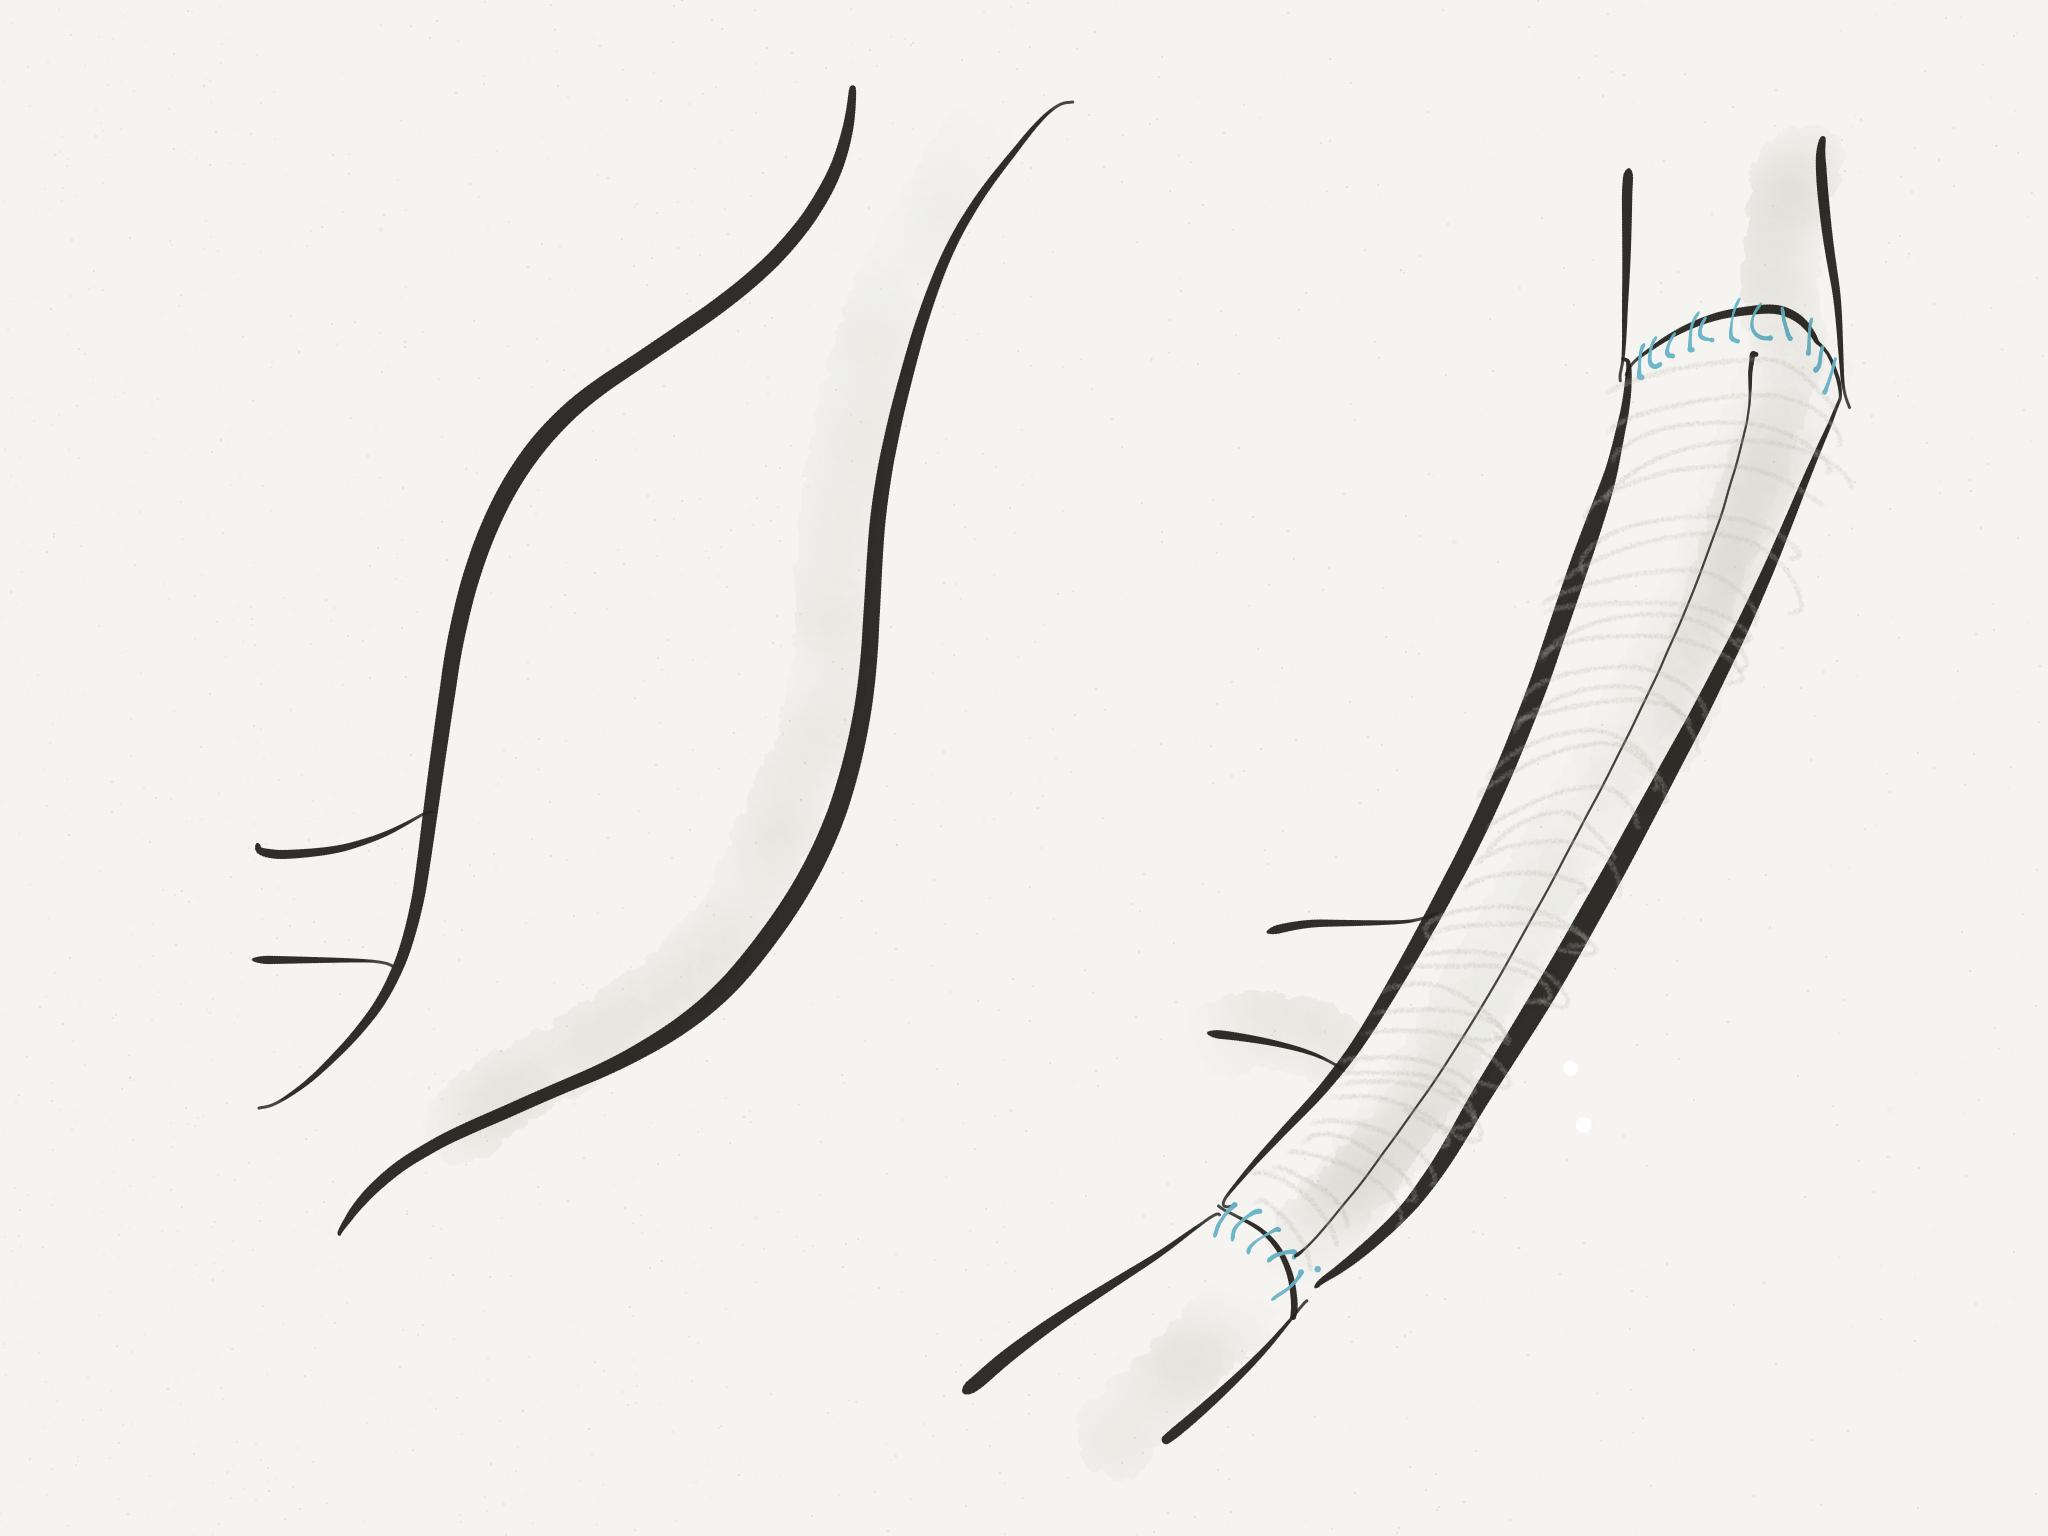 Common Iliac Artery Aneurysm